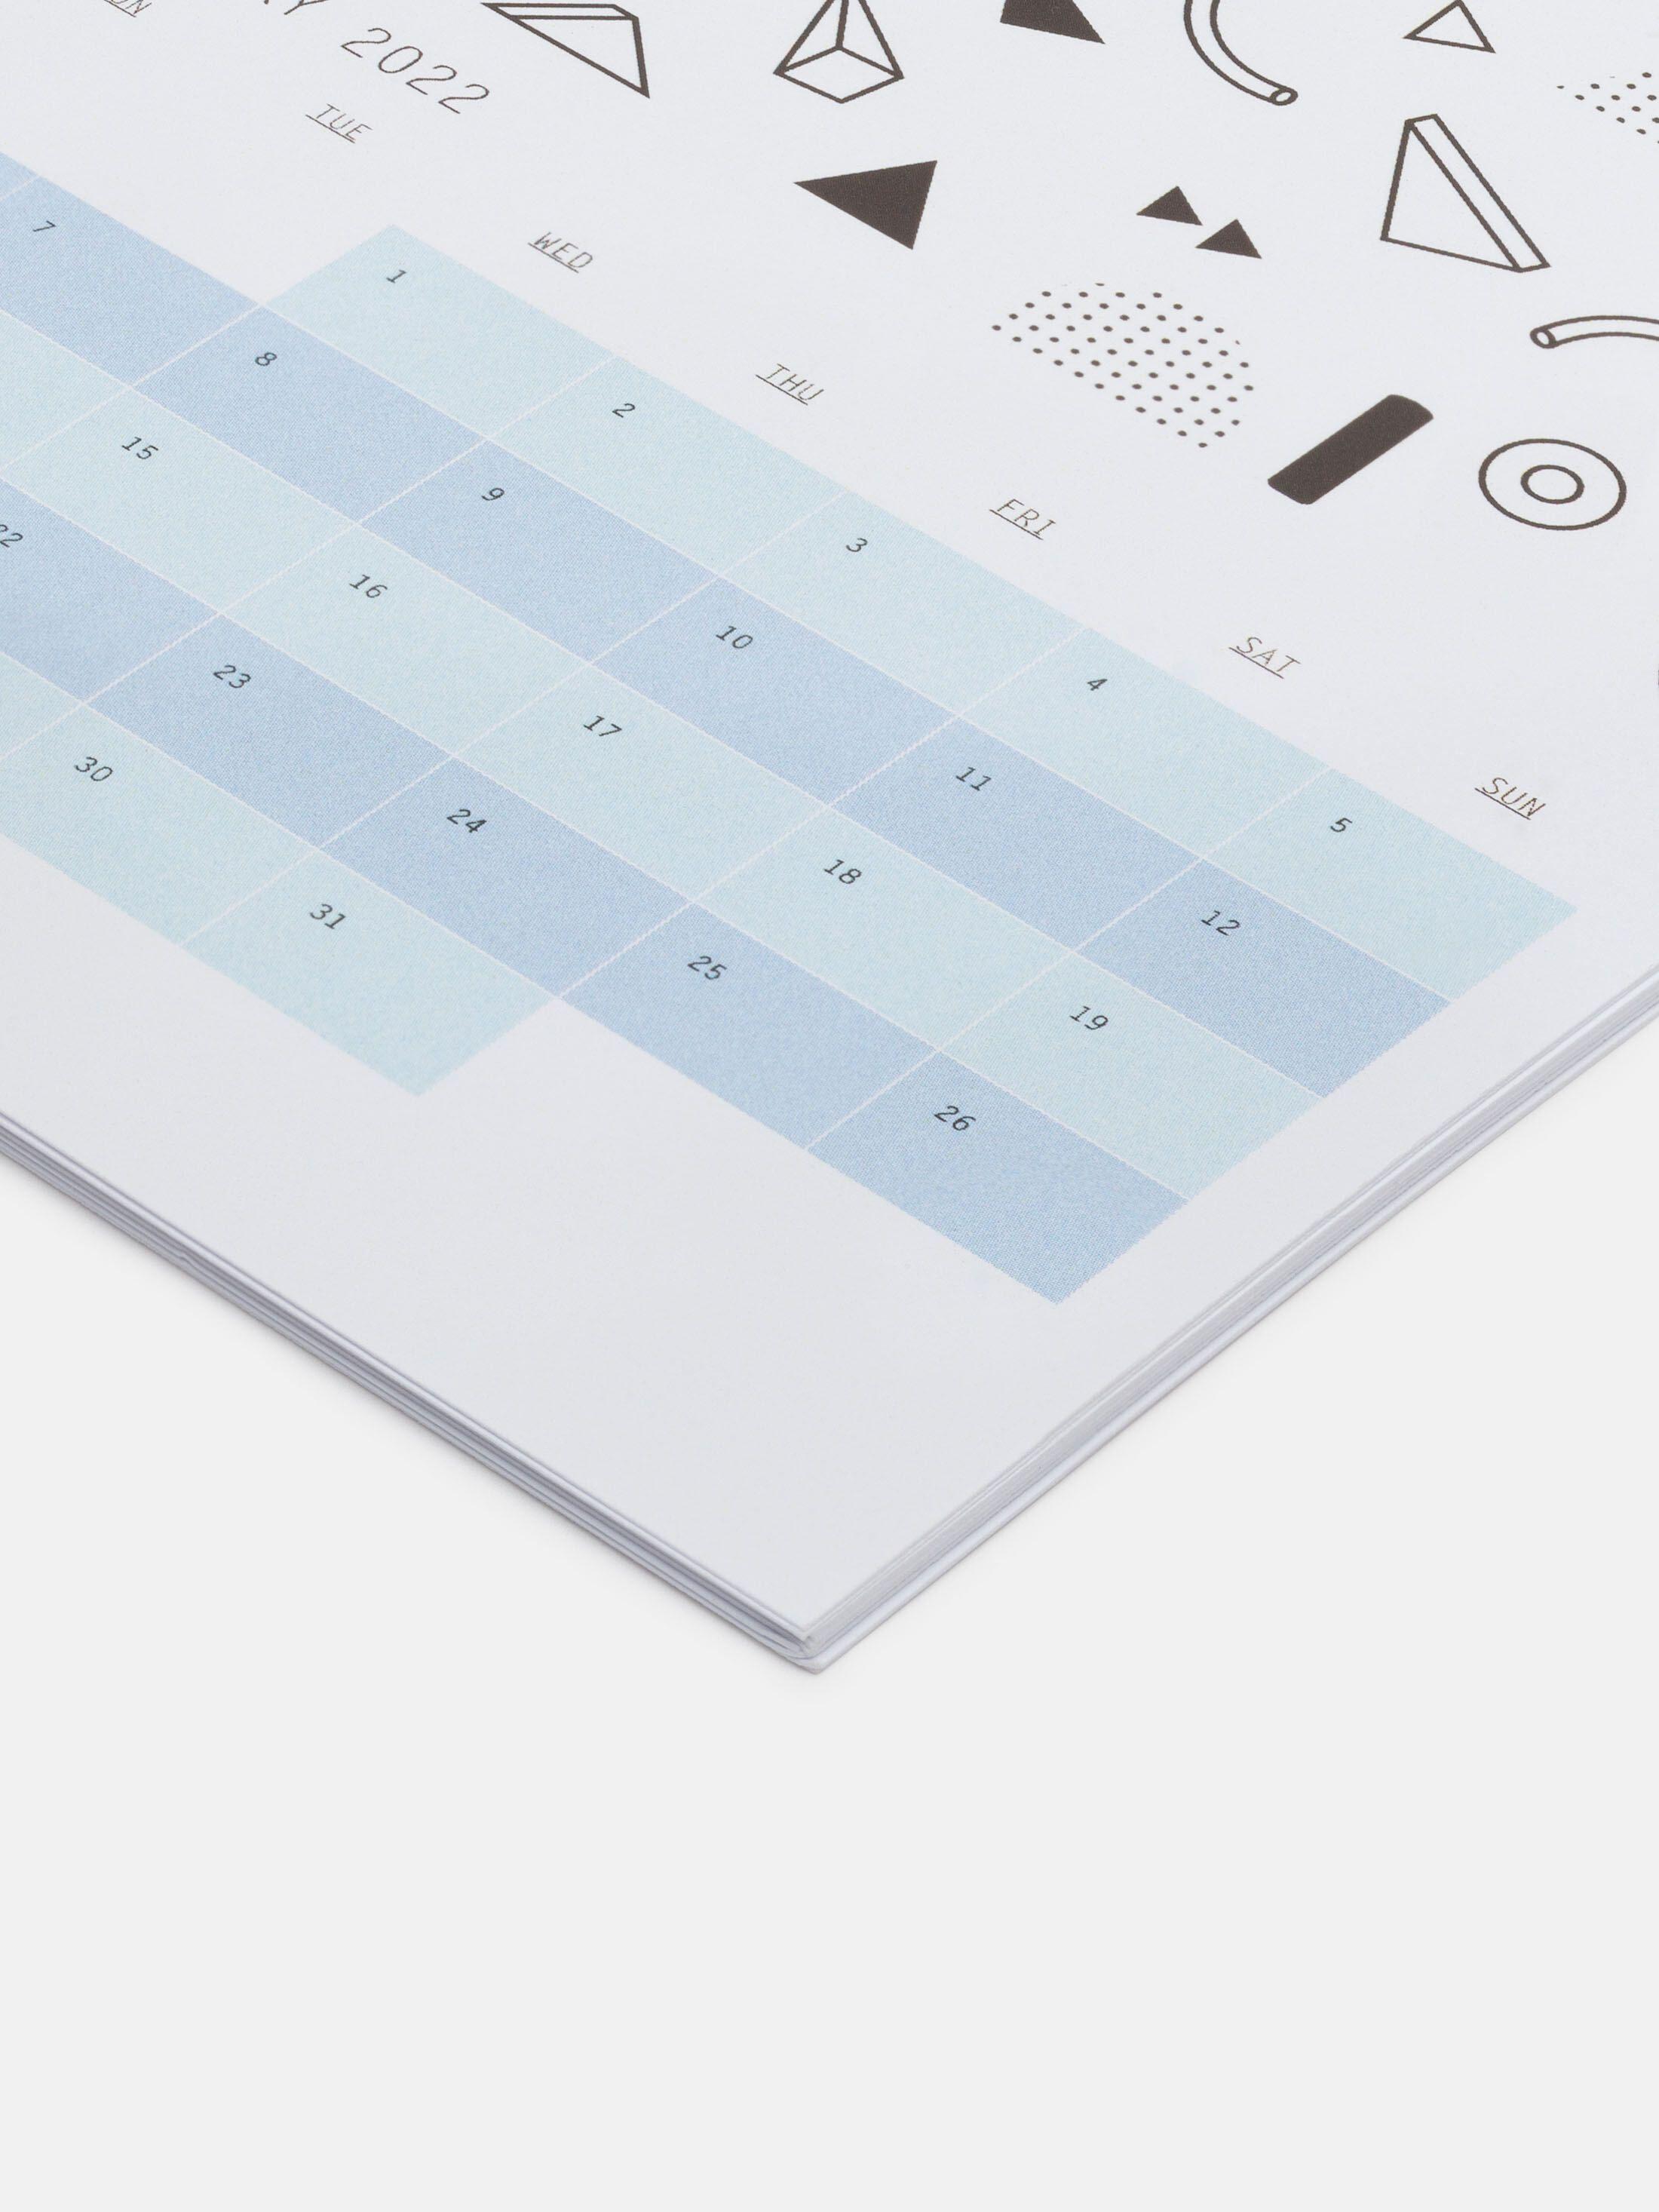 print your own desk calendar australia